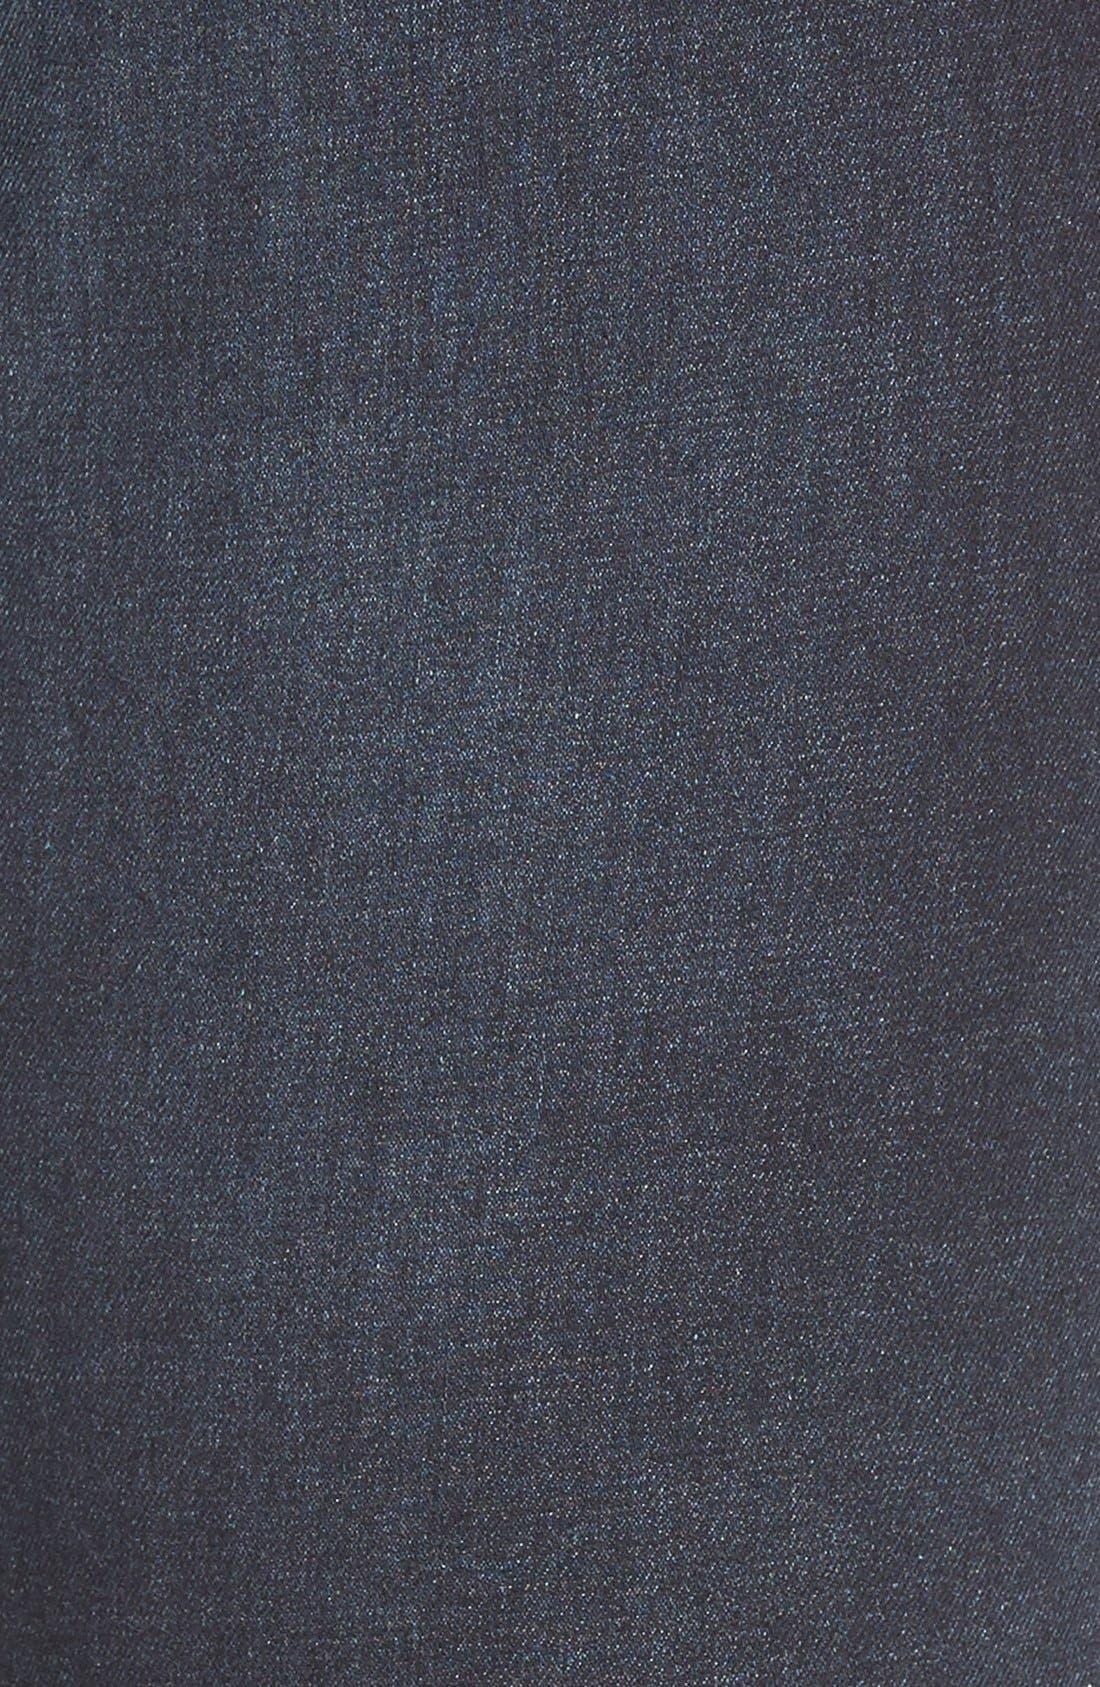 Citizens of Humanity Liya High Waist Slim Boyfriend Jeans,                             Alternate thumbnail 5, color,                             406